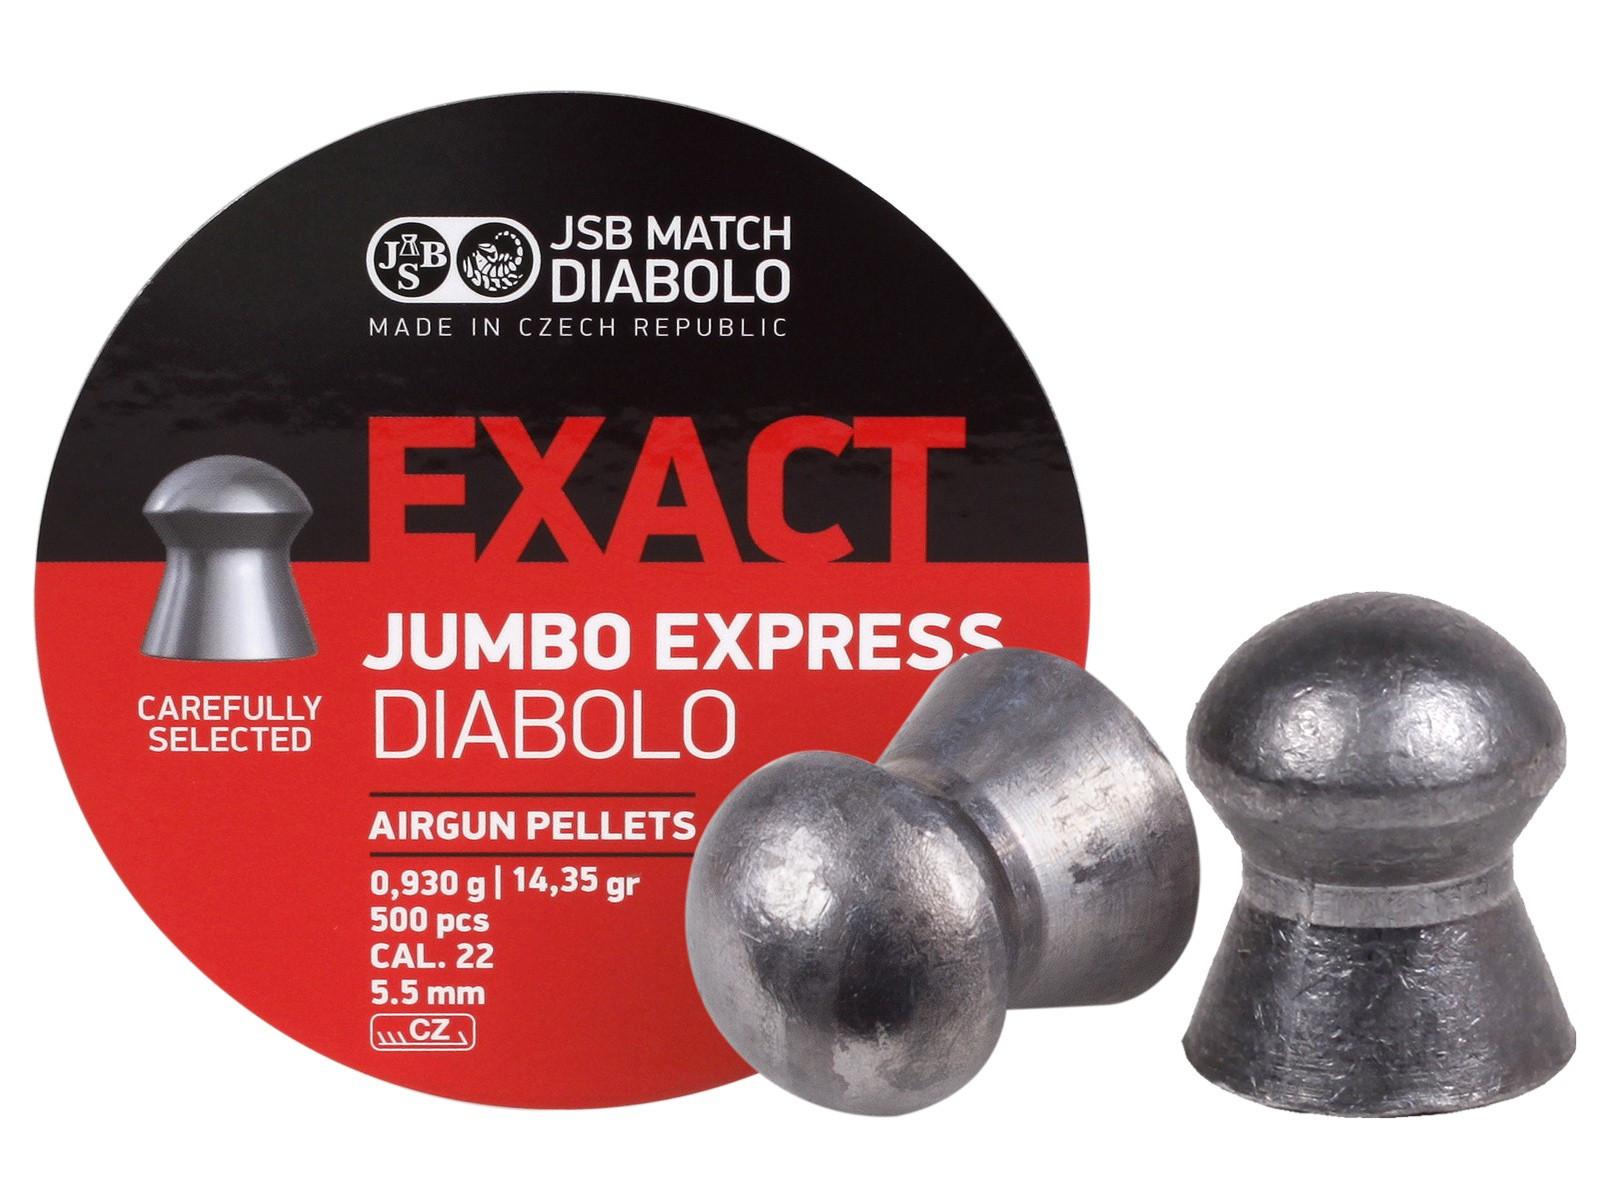 JSB Diabolo Exact Jumbo Express .22 Cal, 14.35 gr - 500 ct